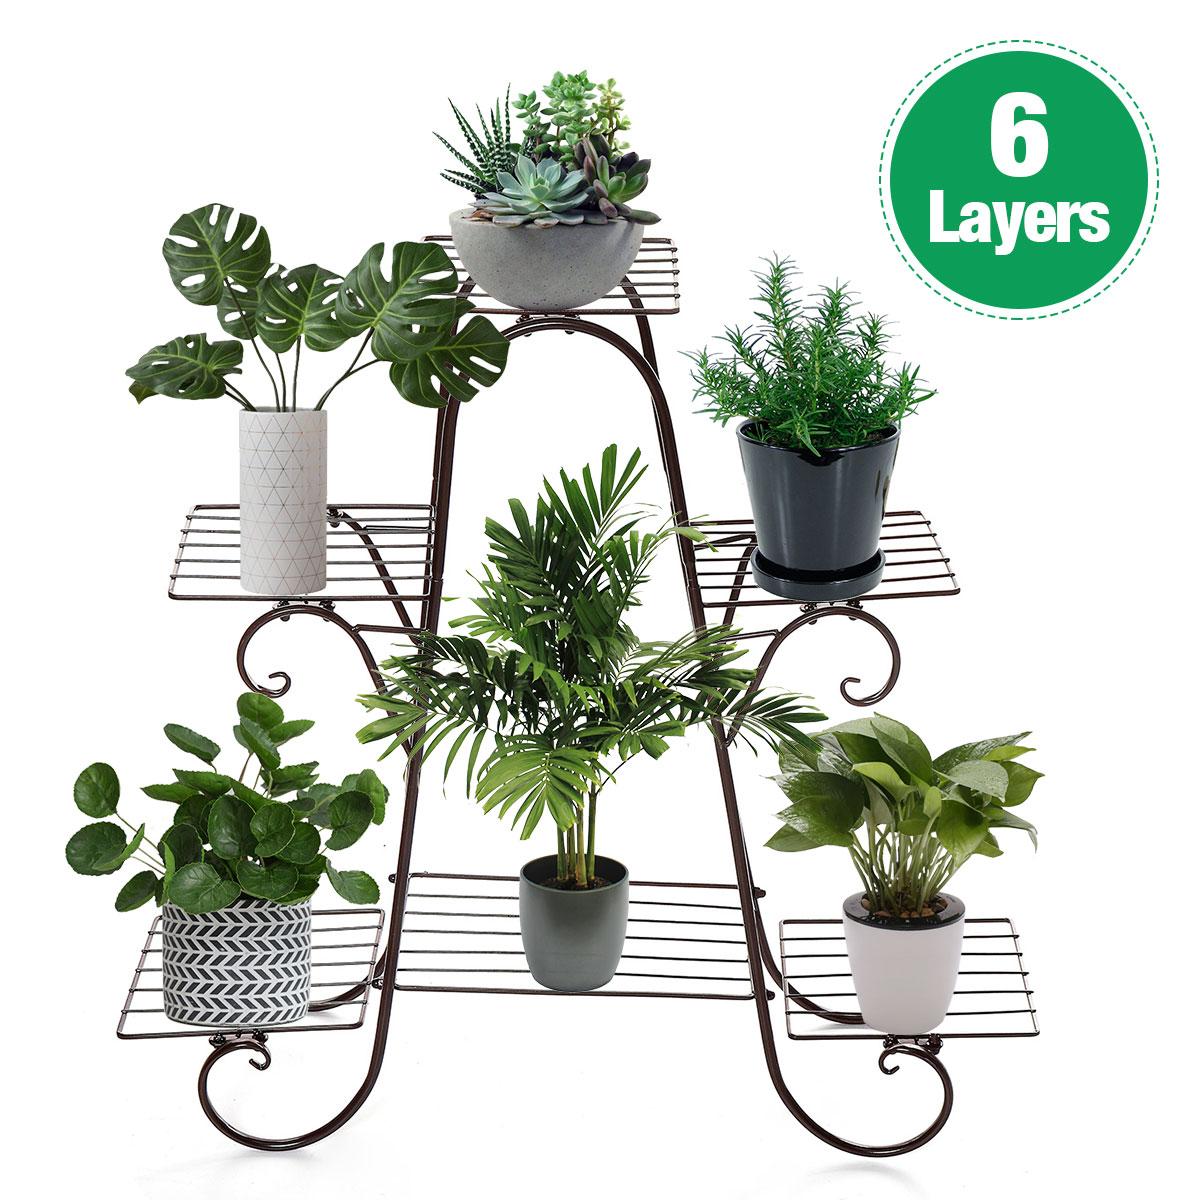 6 Layers European Wrought Iron Flower Stand Indoor Multi-story Flower Stand Rack Floor-standing Balcony Flower Pot Shelves